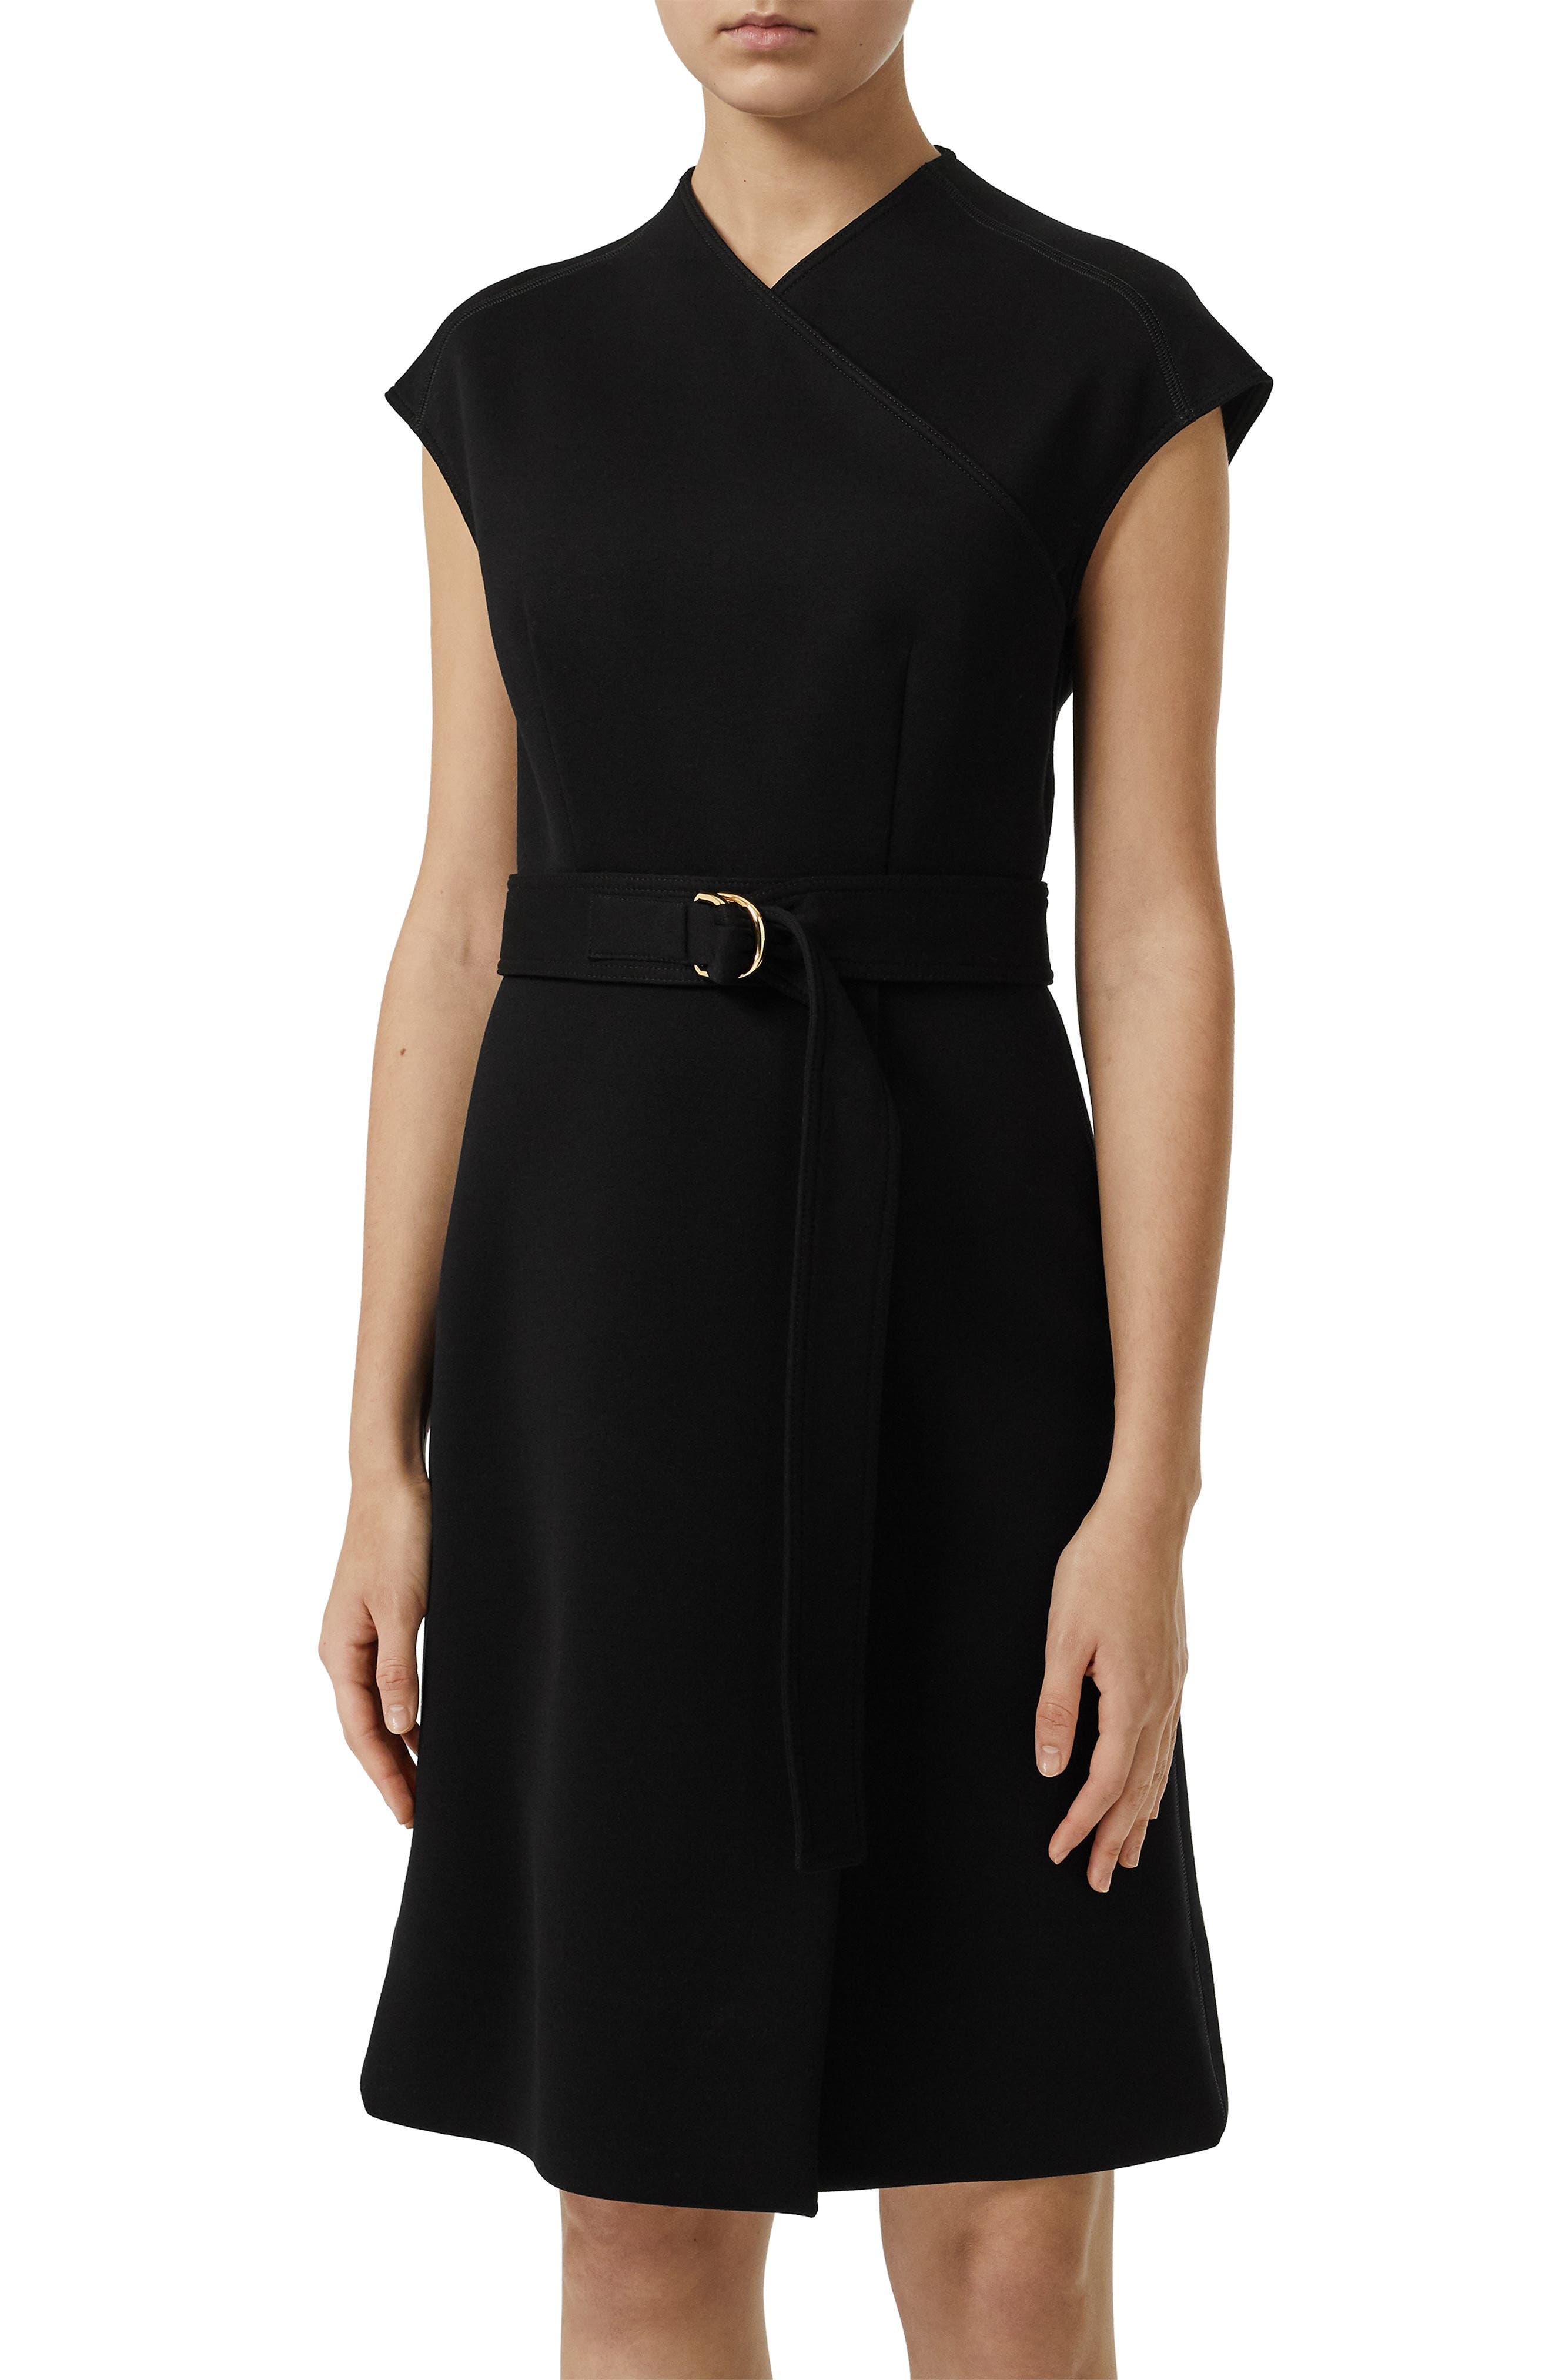 Burberry Dulsie D-Ring Detail Bonded Jersey Dress, Black